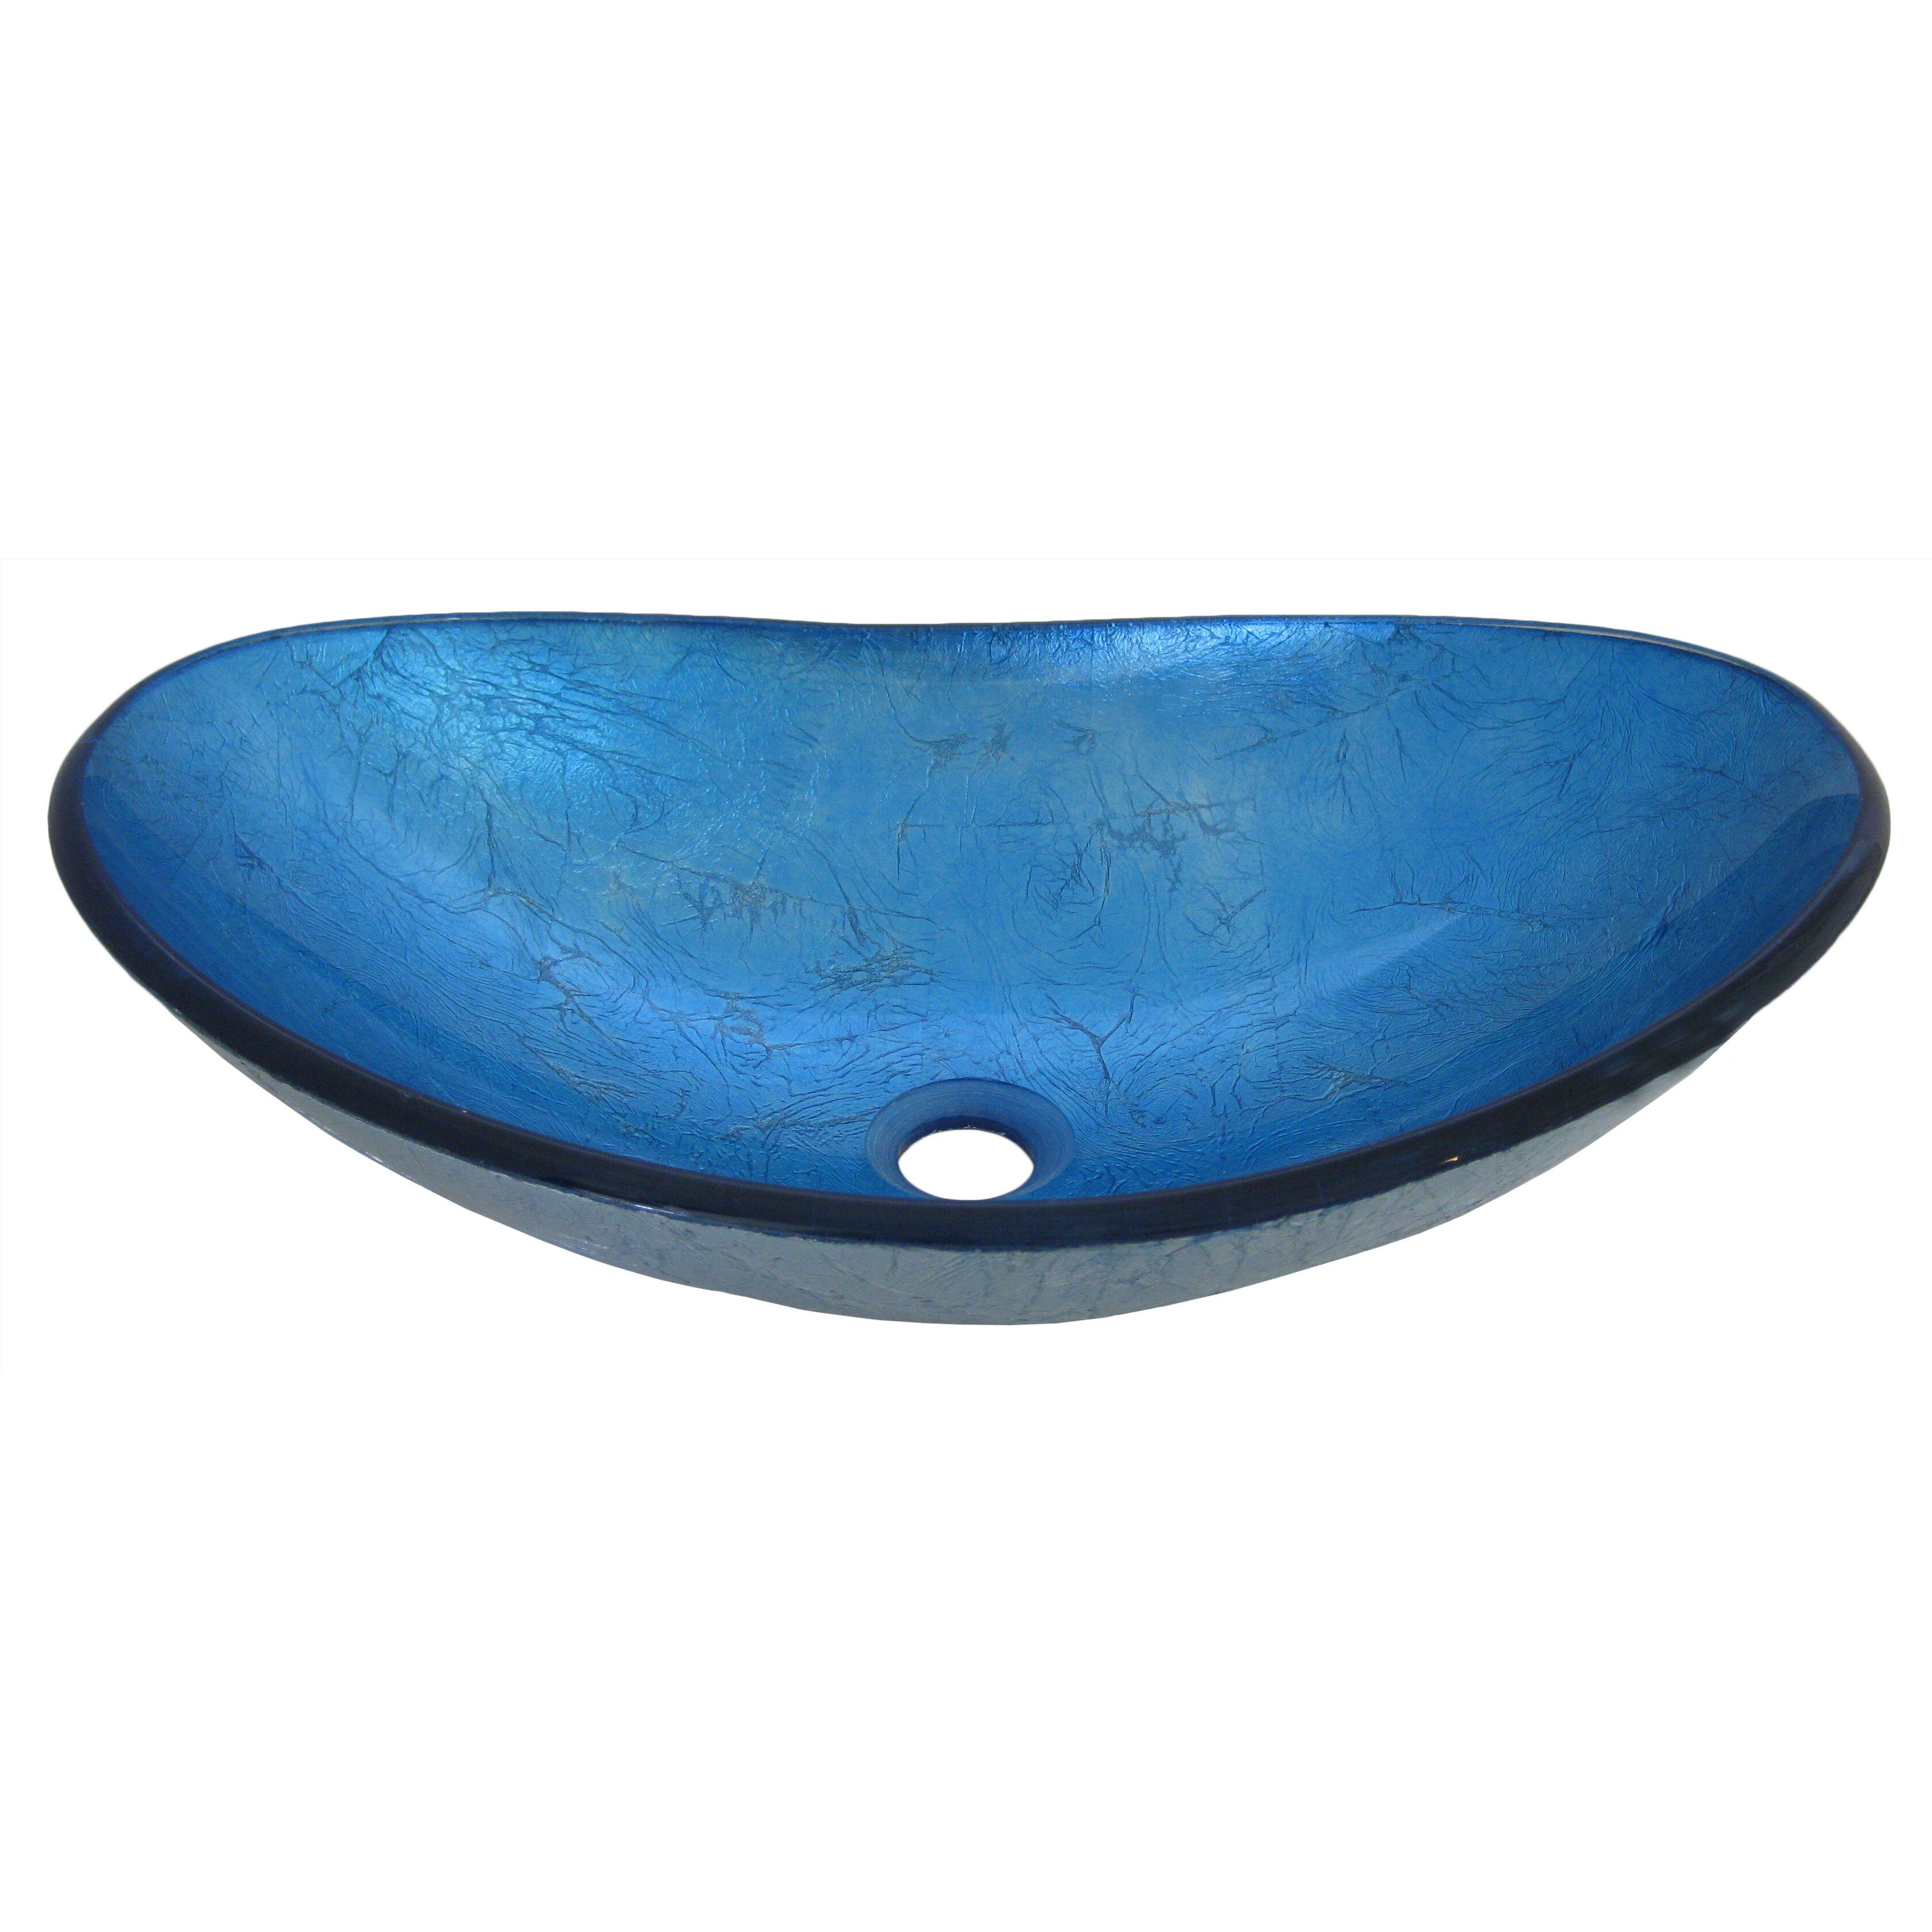 Novatto Azzurro Glass Vessel Bathroom Sink & Reviews Wayfair